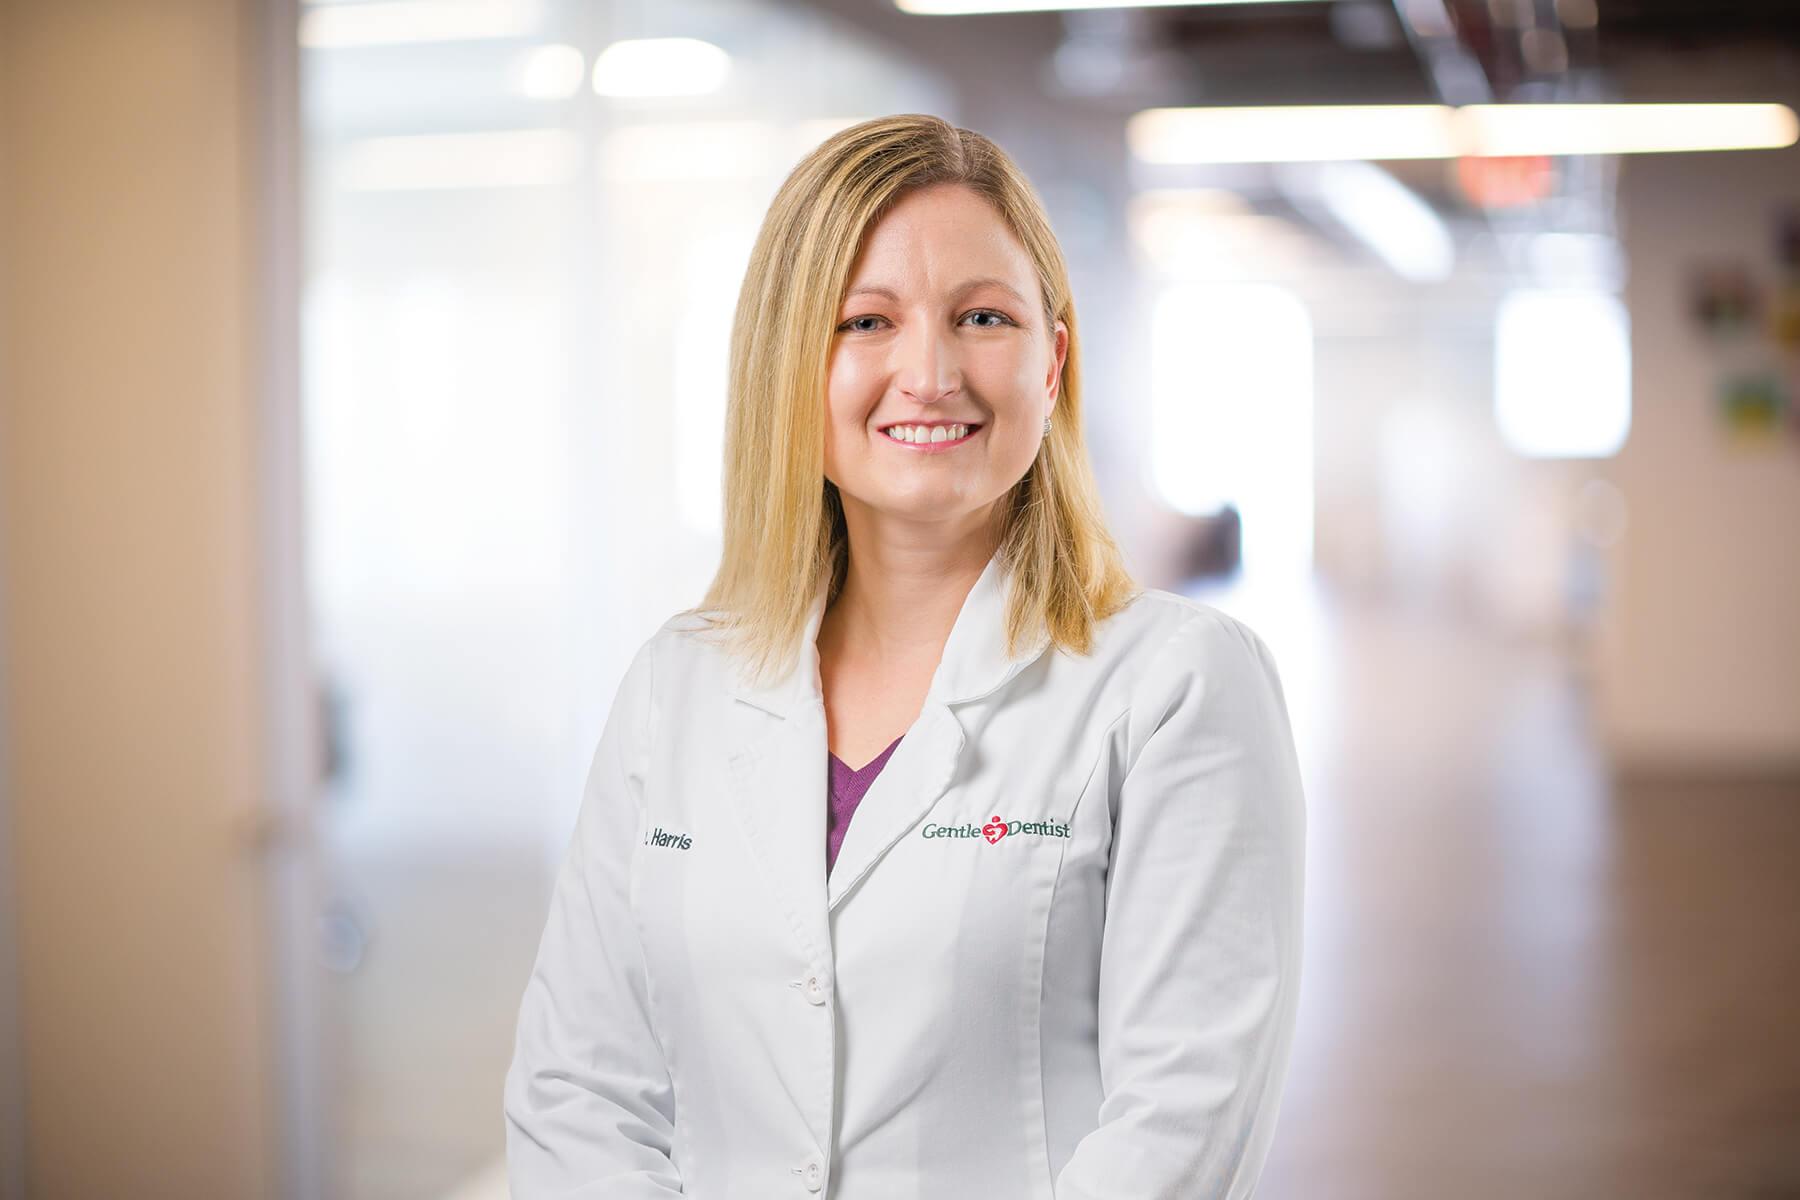 Dr. Amanda Harris